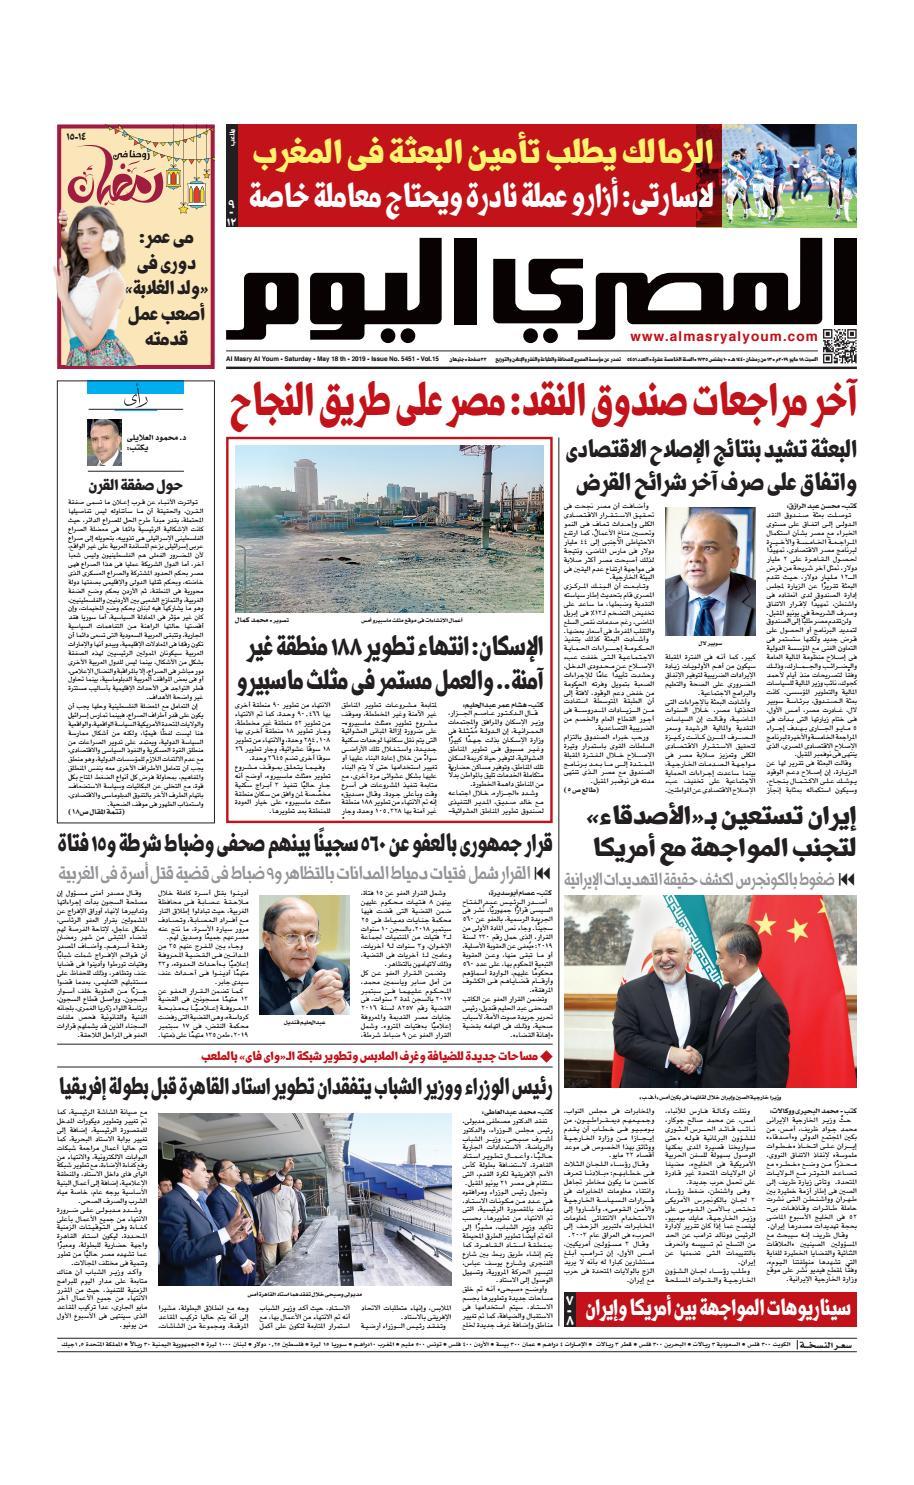 عدد السبت 18 05 2019 By Al Masry Media Corp Issuu